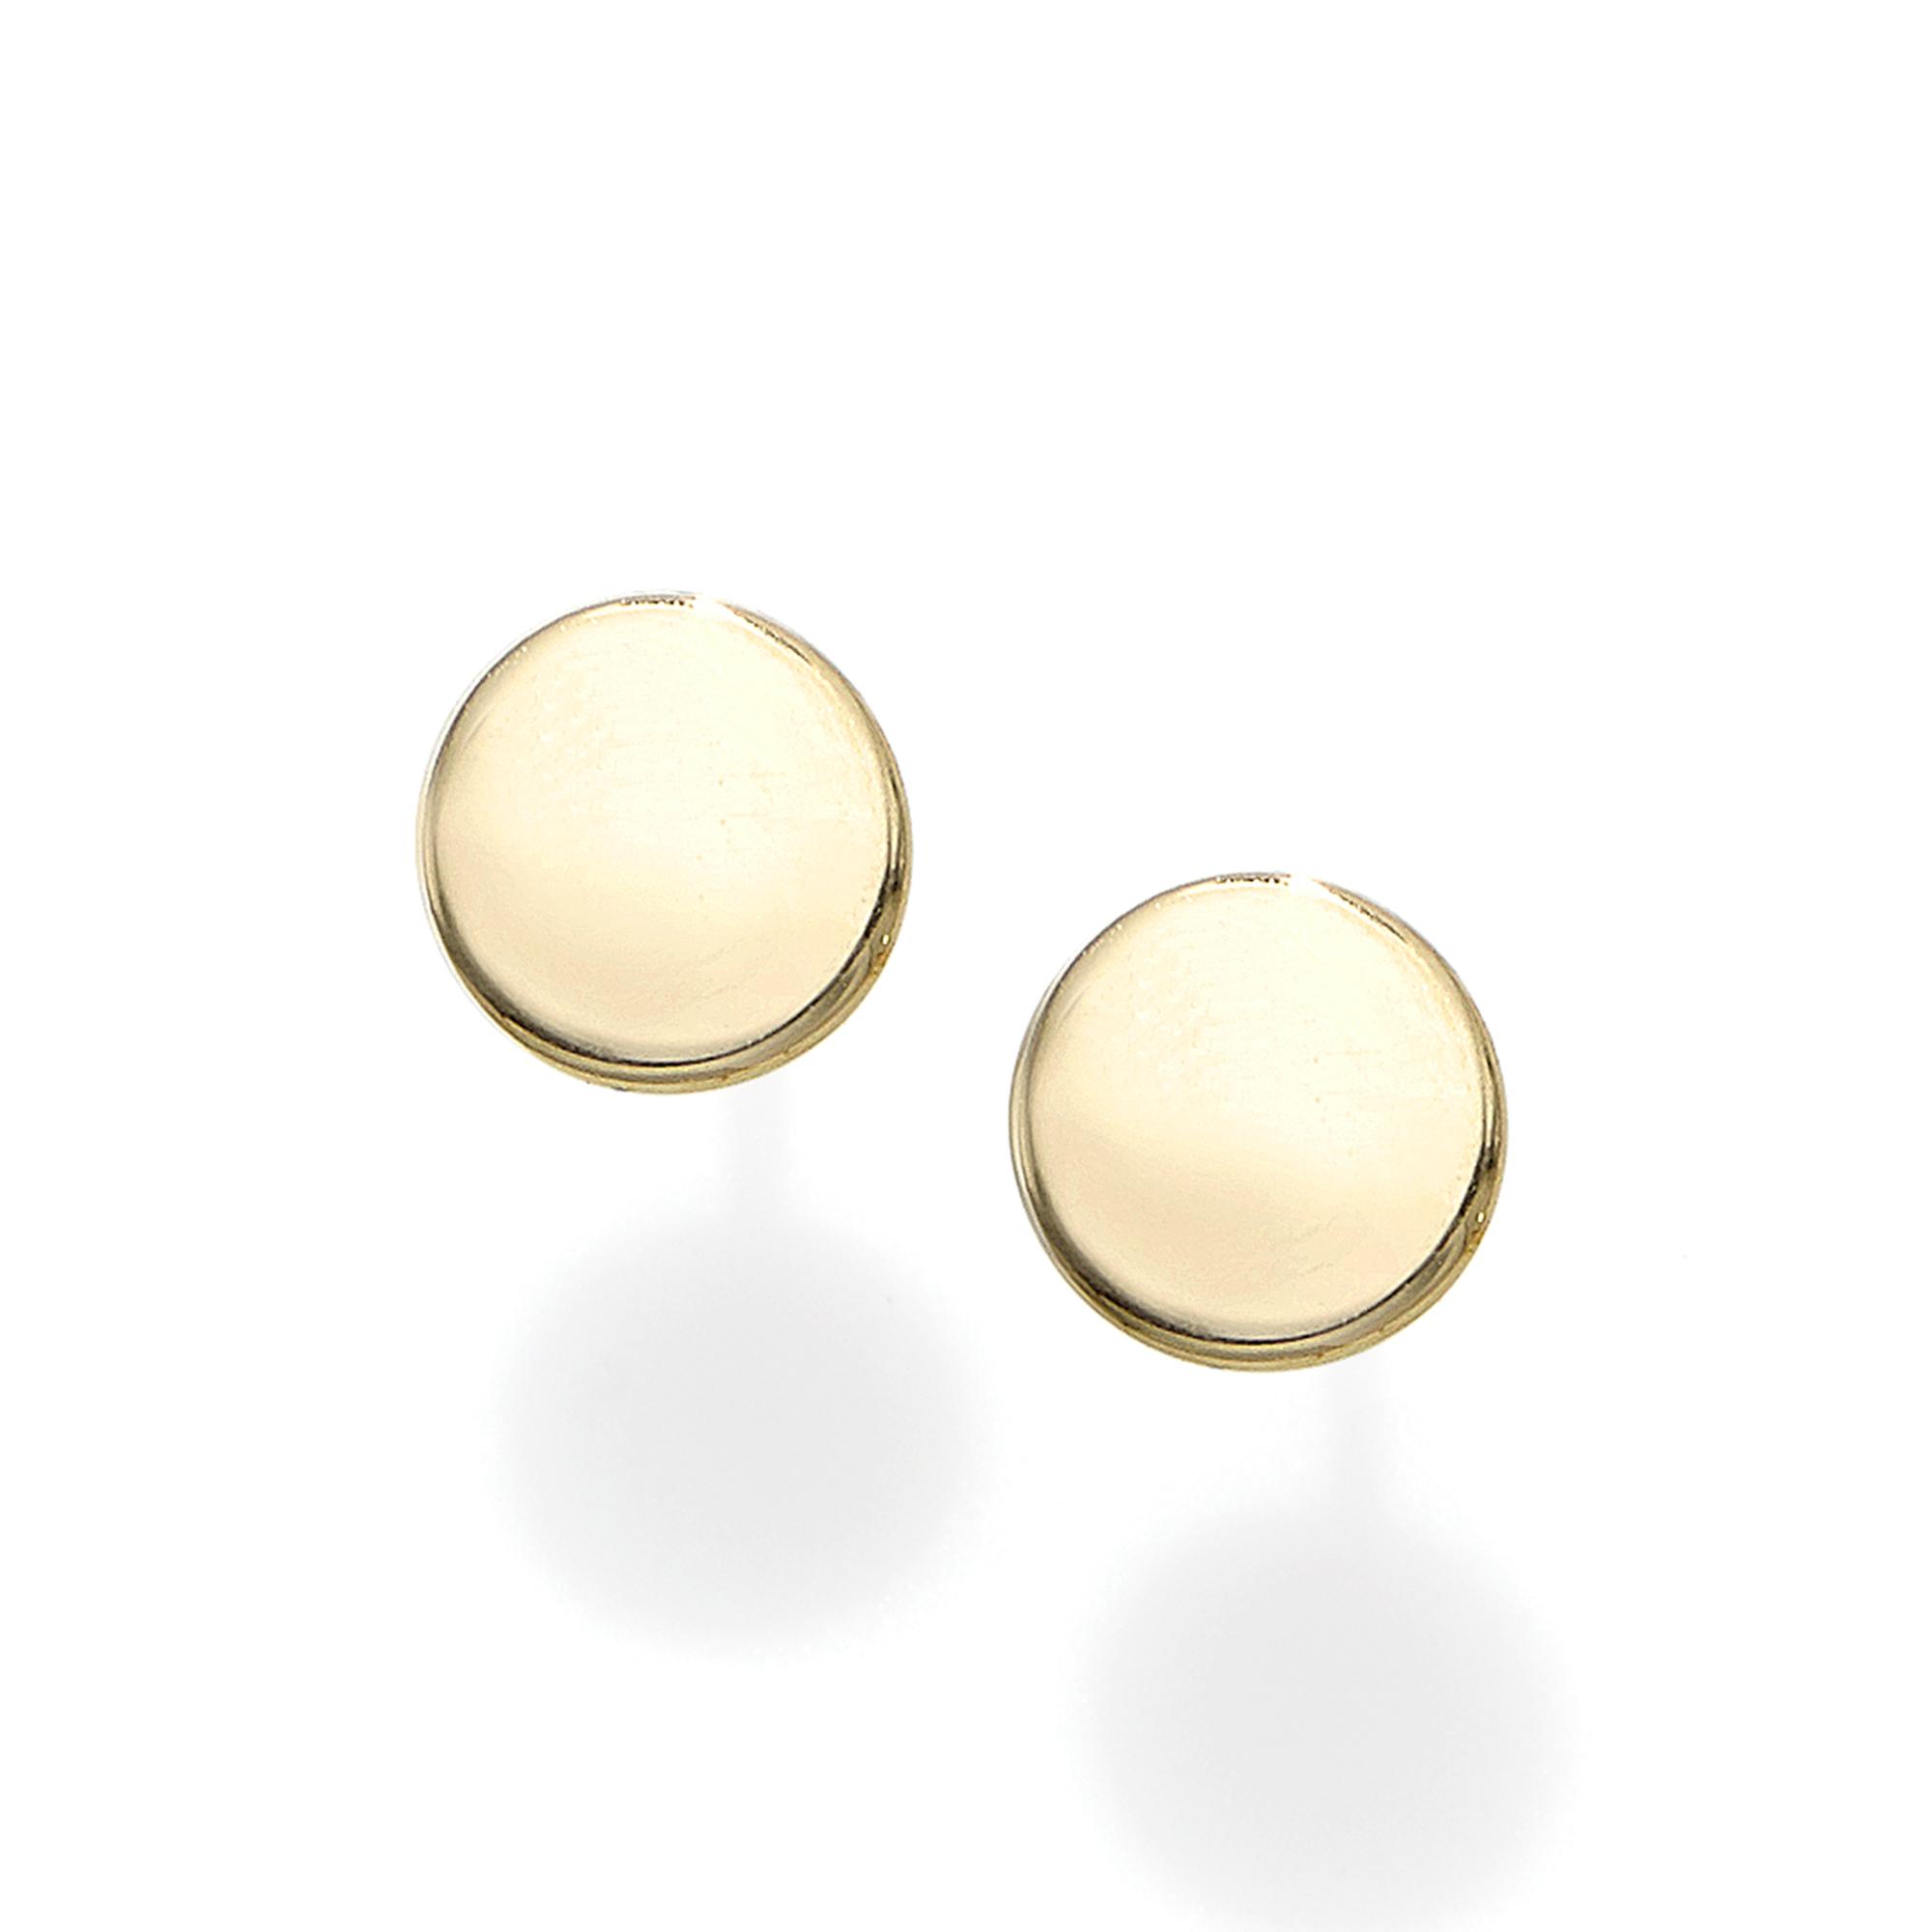 14k-gold-polished-circle-stud-earring-er8802_ring